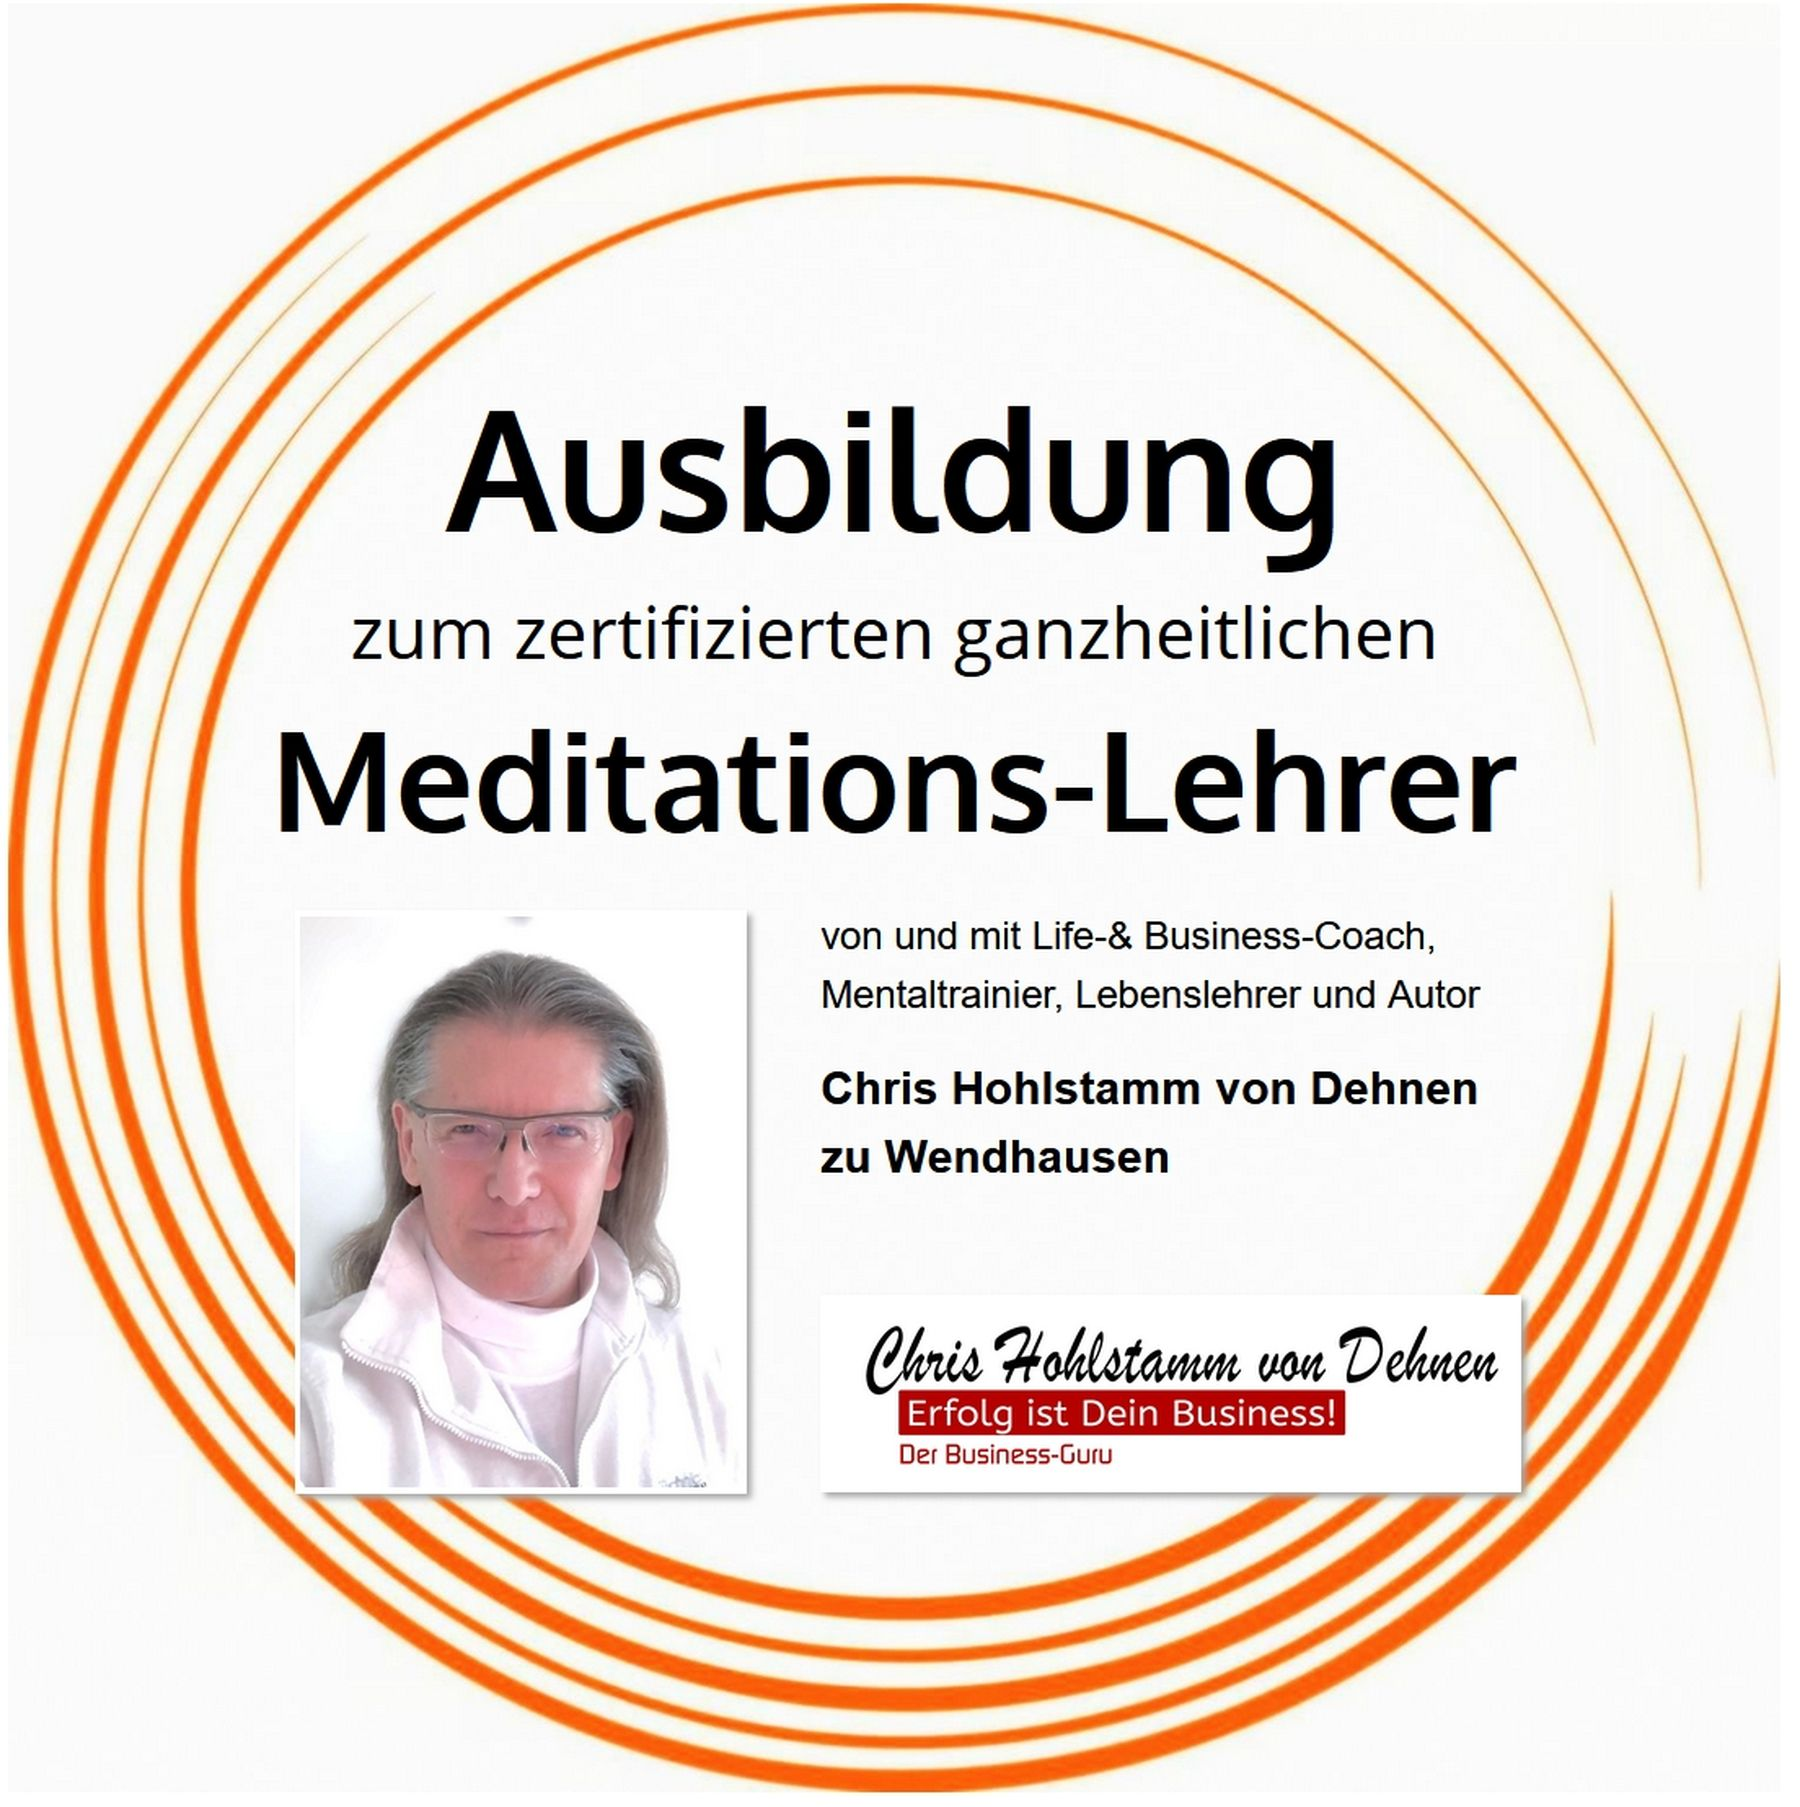 Ausbildung zum Meditations-Lehrer u. Entspannungs-Coach